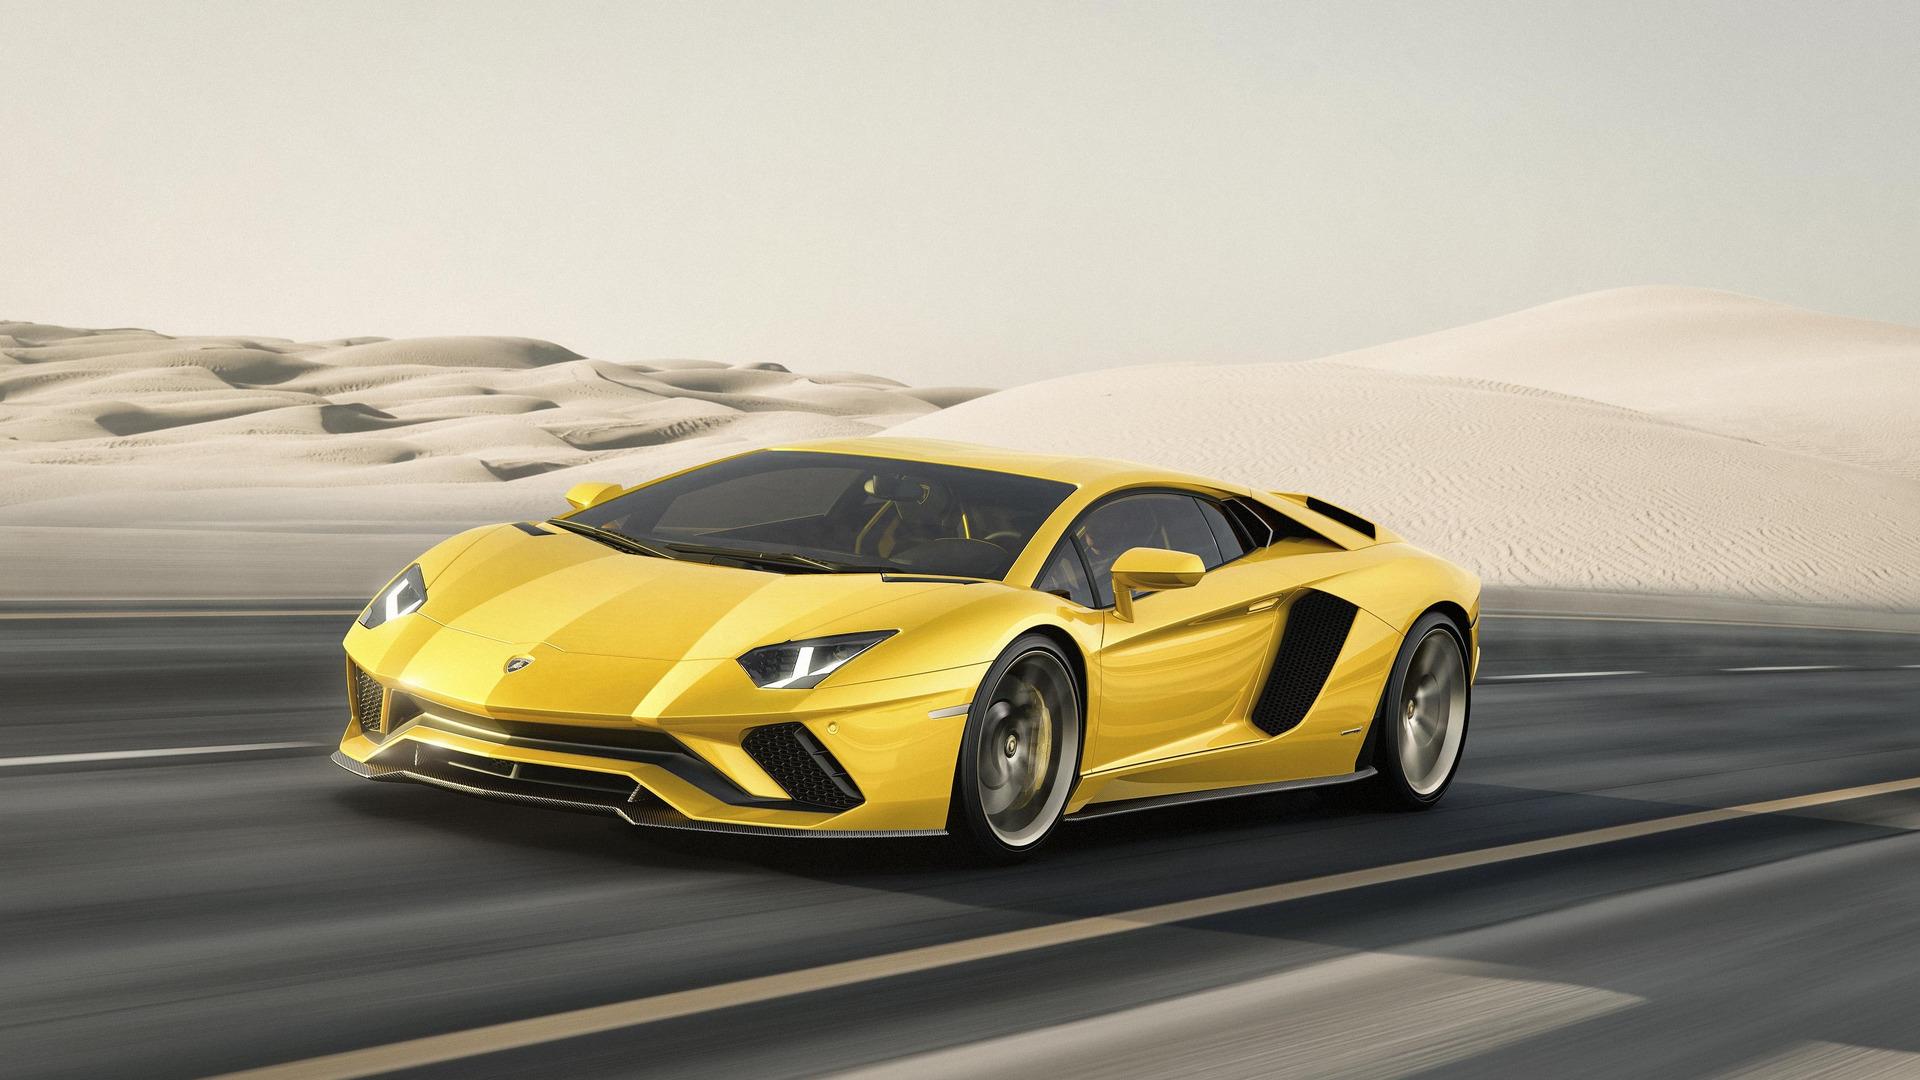 Lamborghini Aventador S Debuts With More Power Rear Wheel Steering